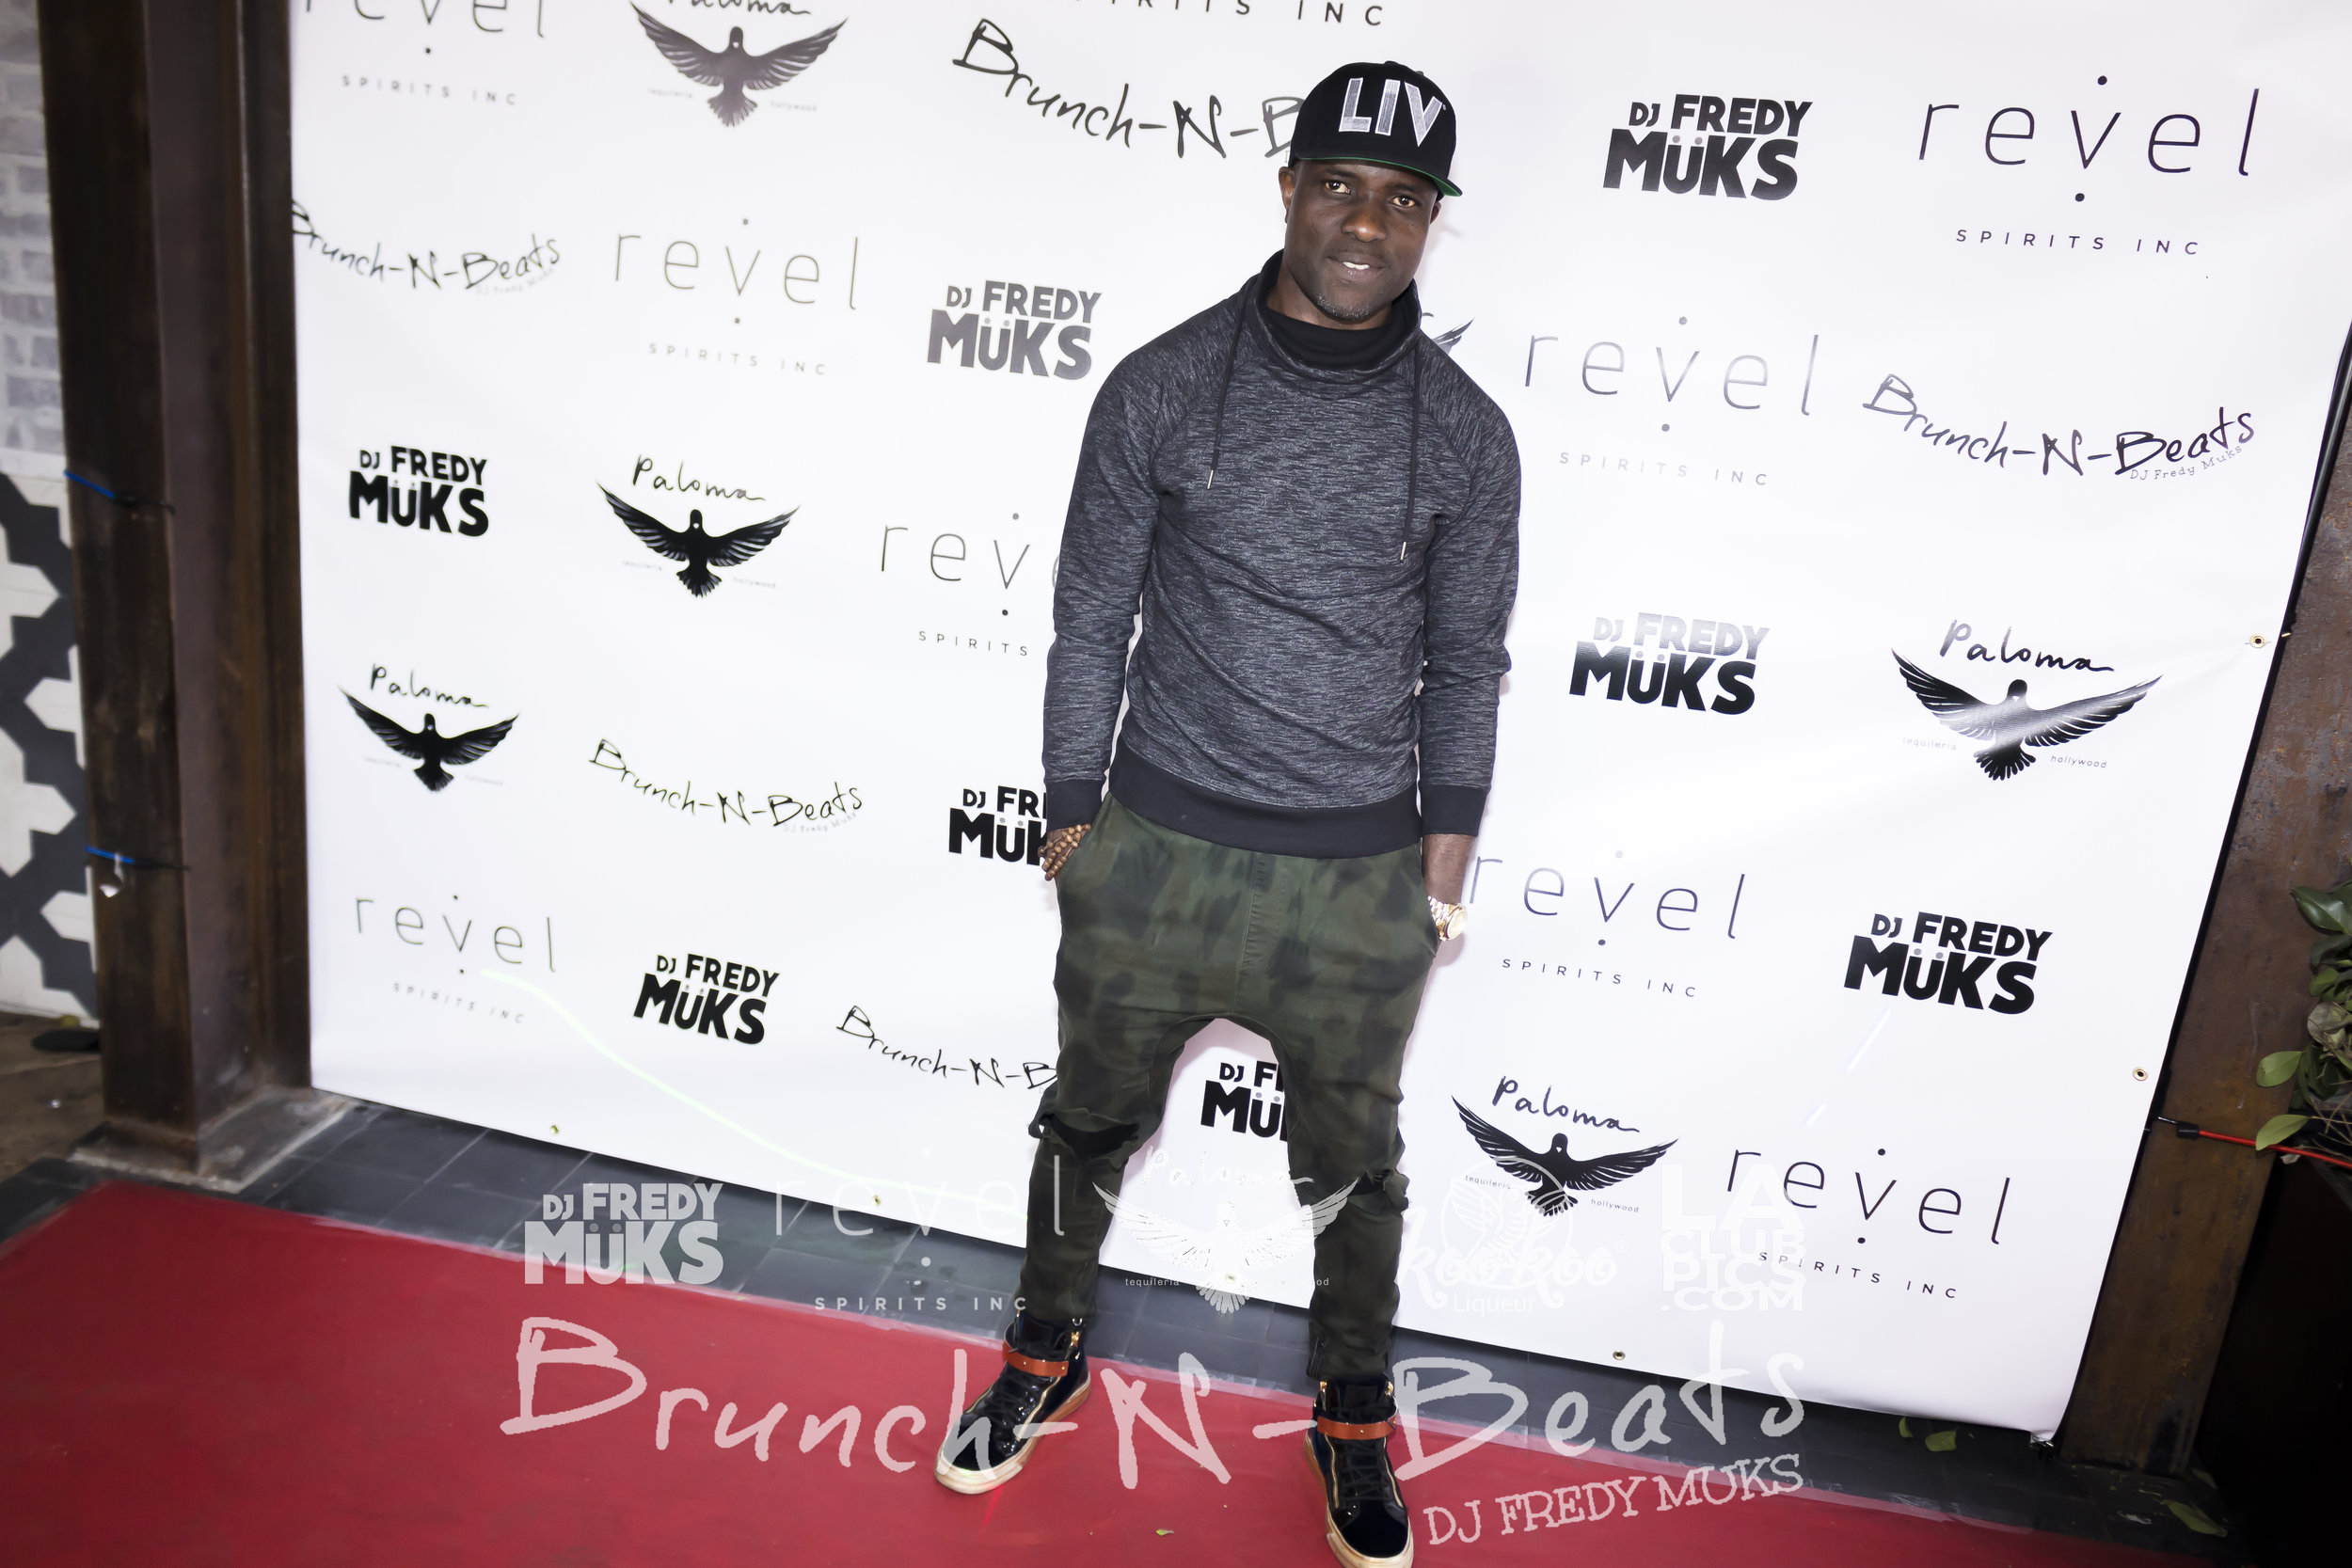 Brunch-N-Beats - Paloma Hollywood - 02-25-18_12.jpg